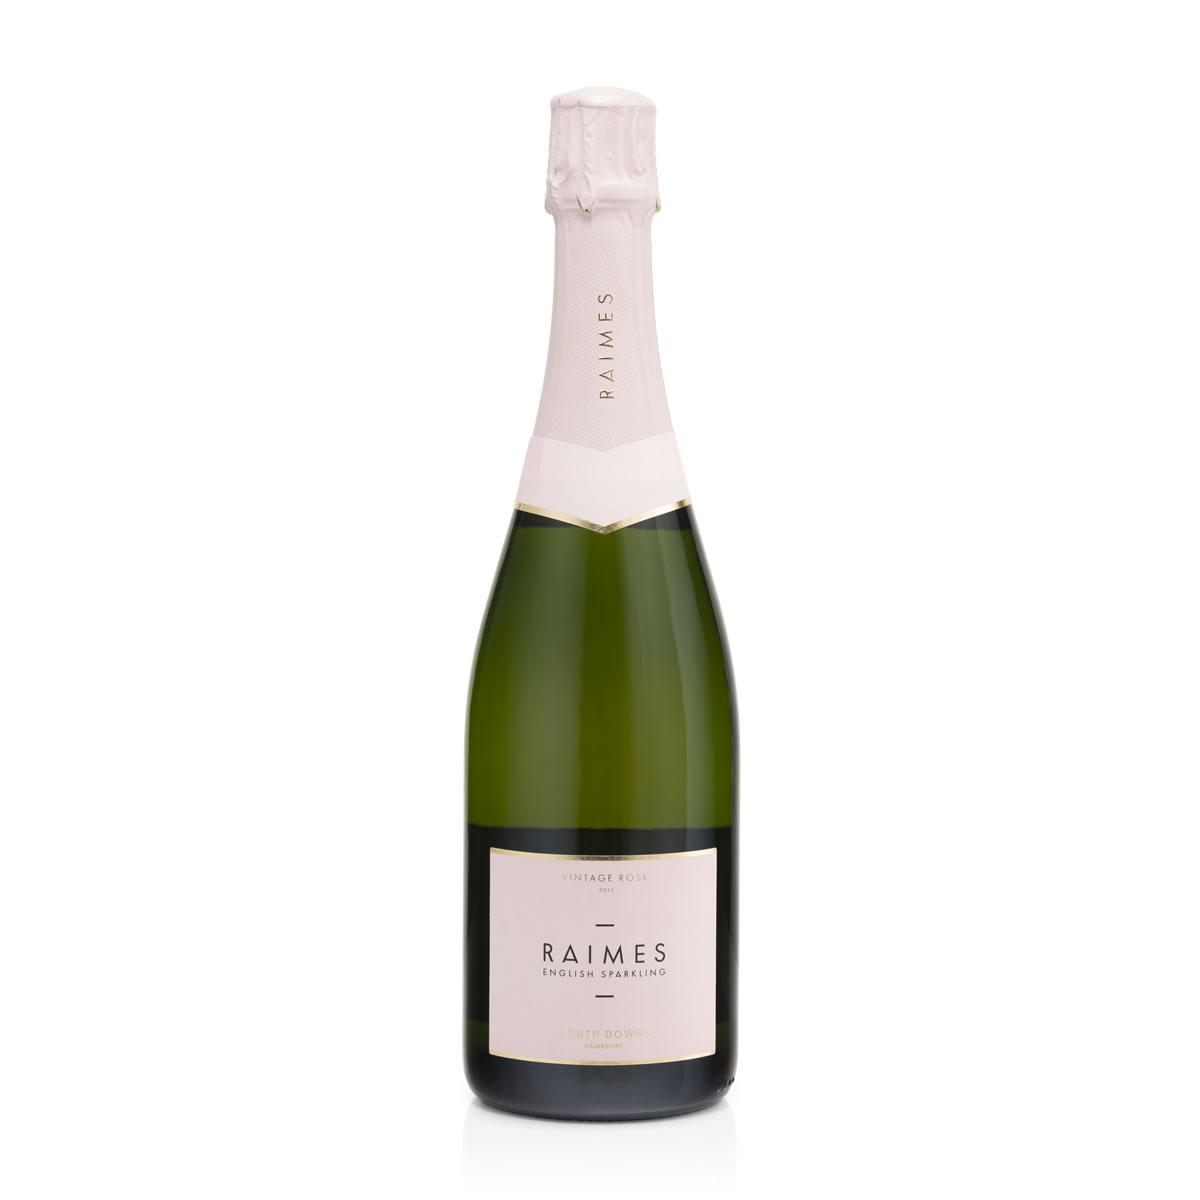 2015 VINTAGE ROSE - Raimes English Sparkling Wine